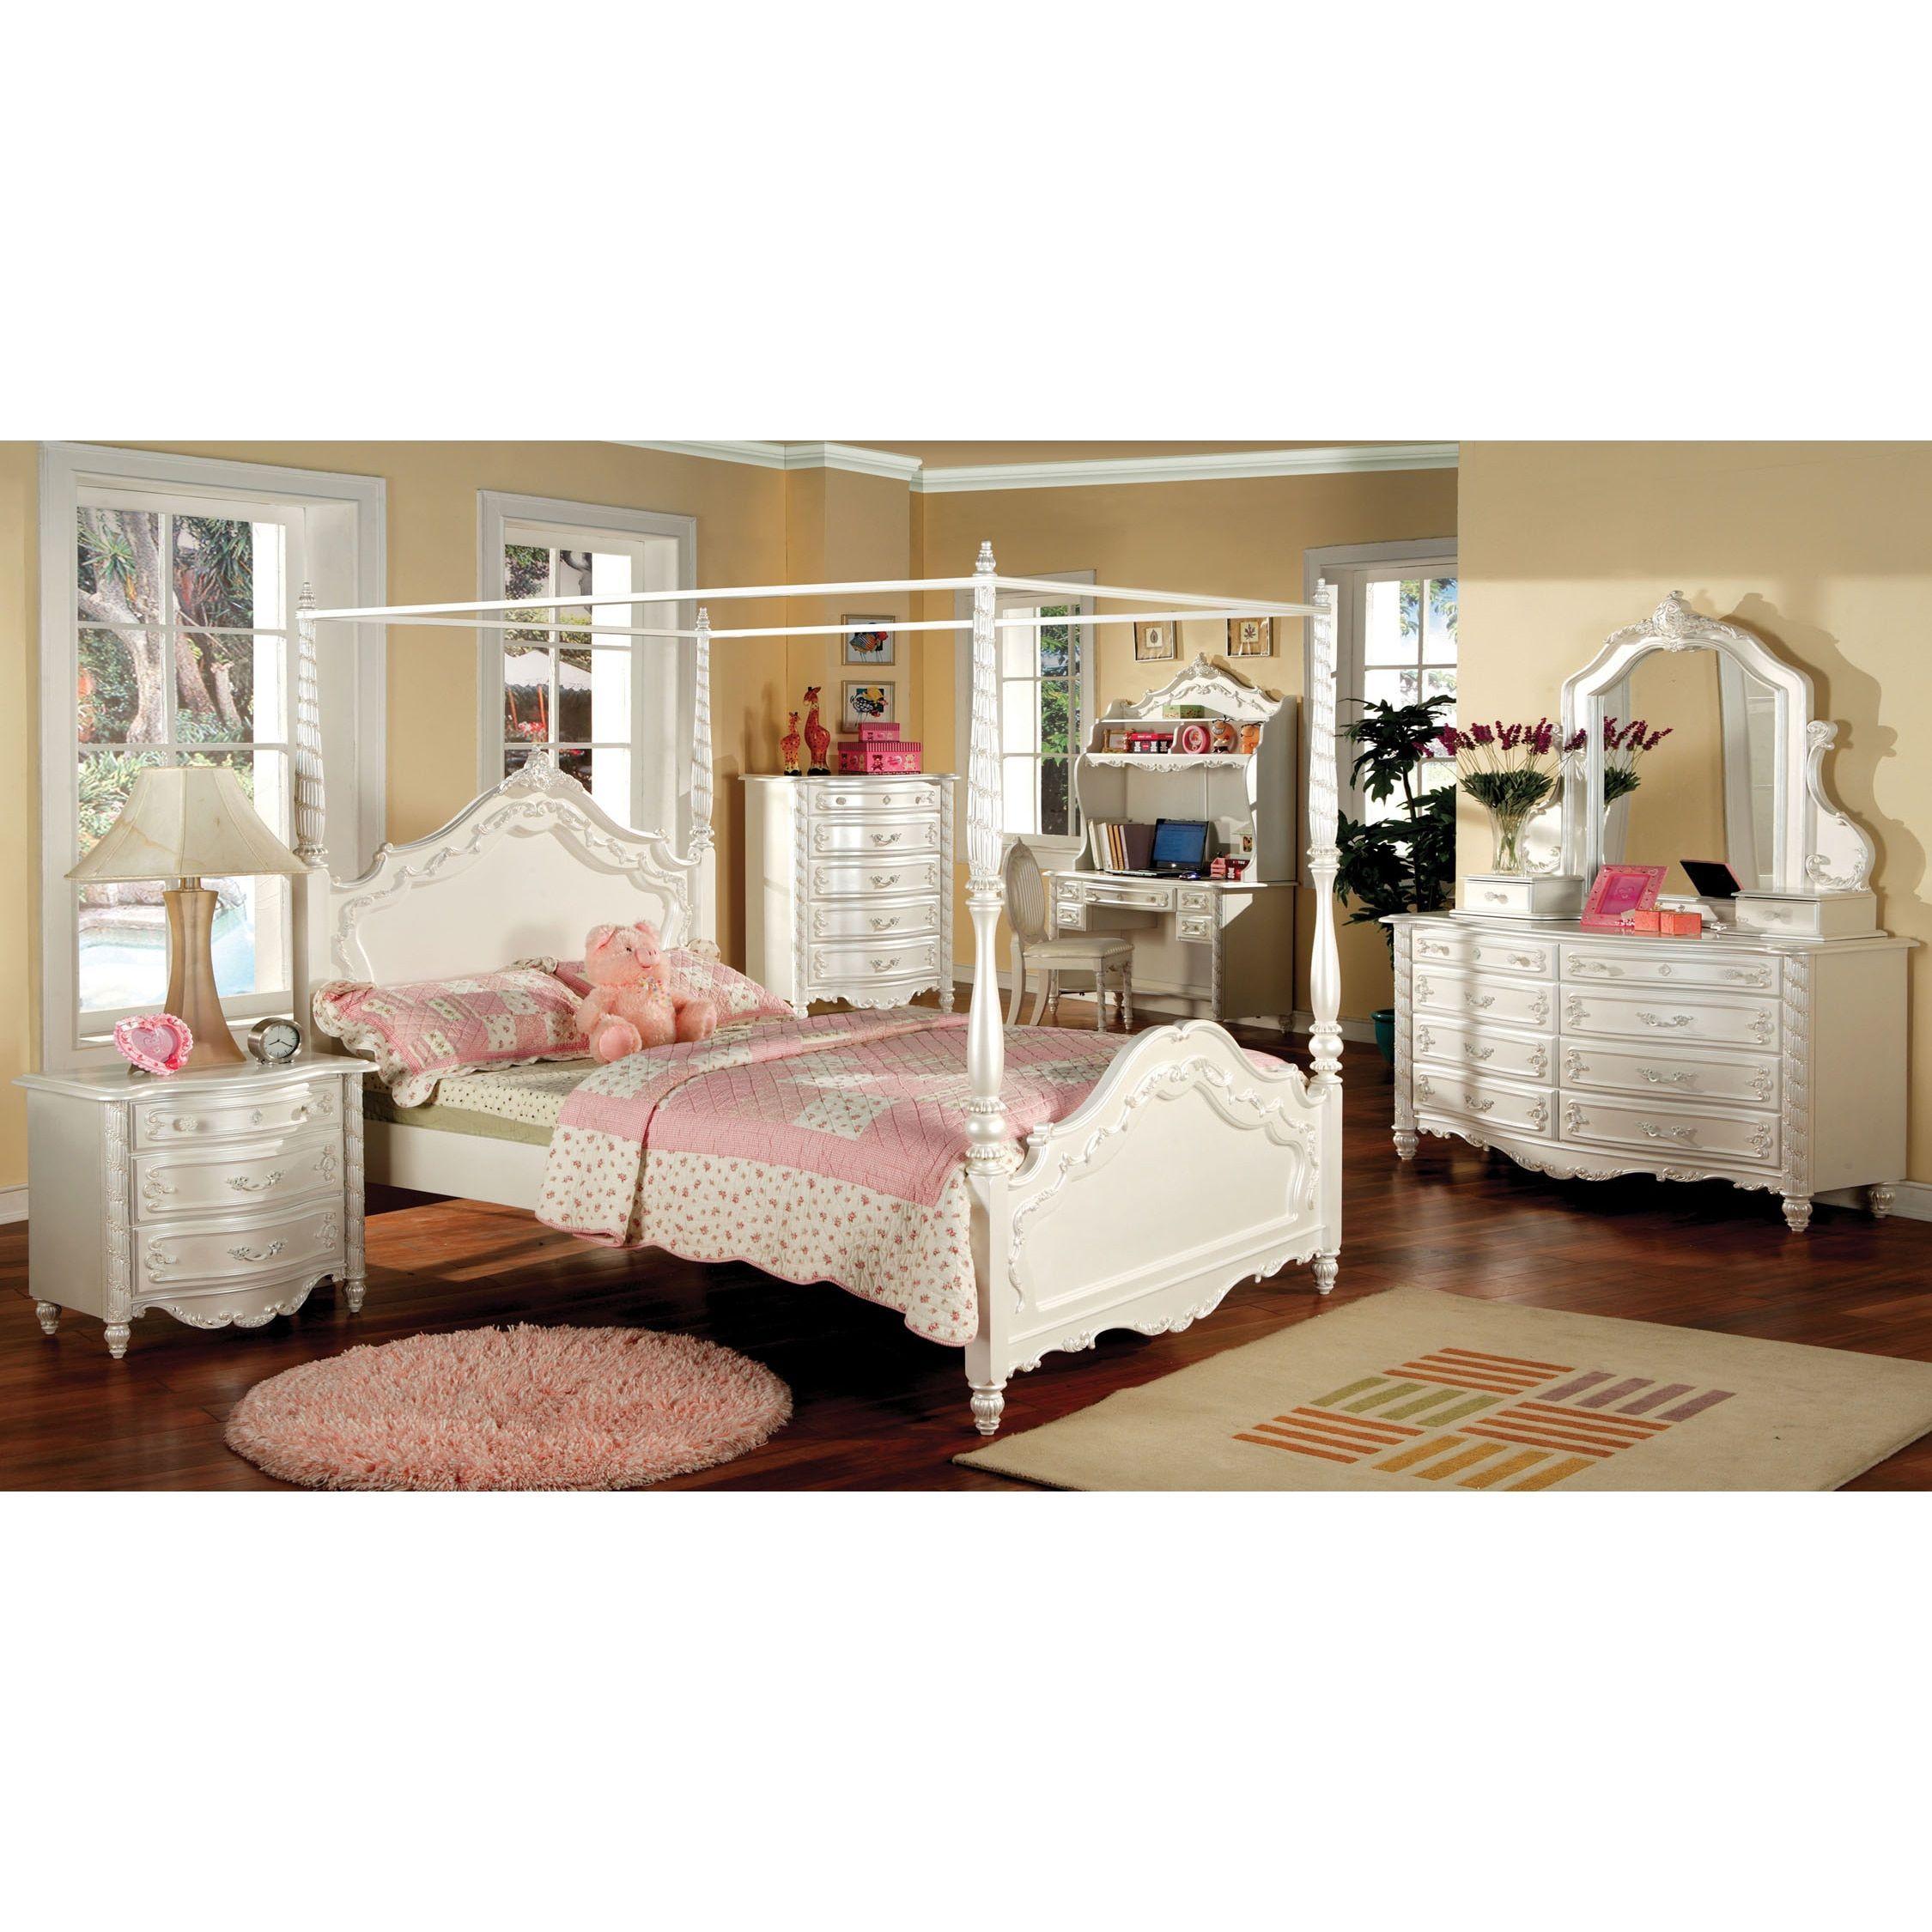 Furniture Of America Talia Pearl White 4 Piece Canopy Bed Set Full